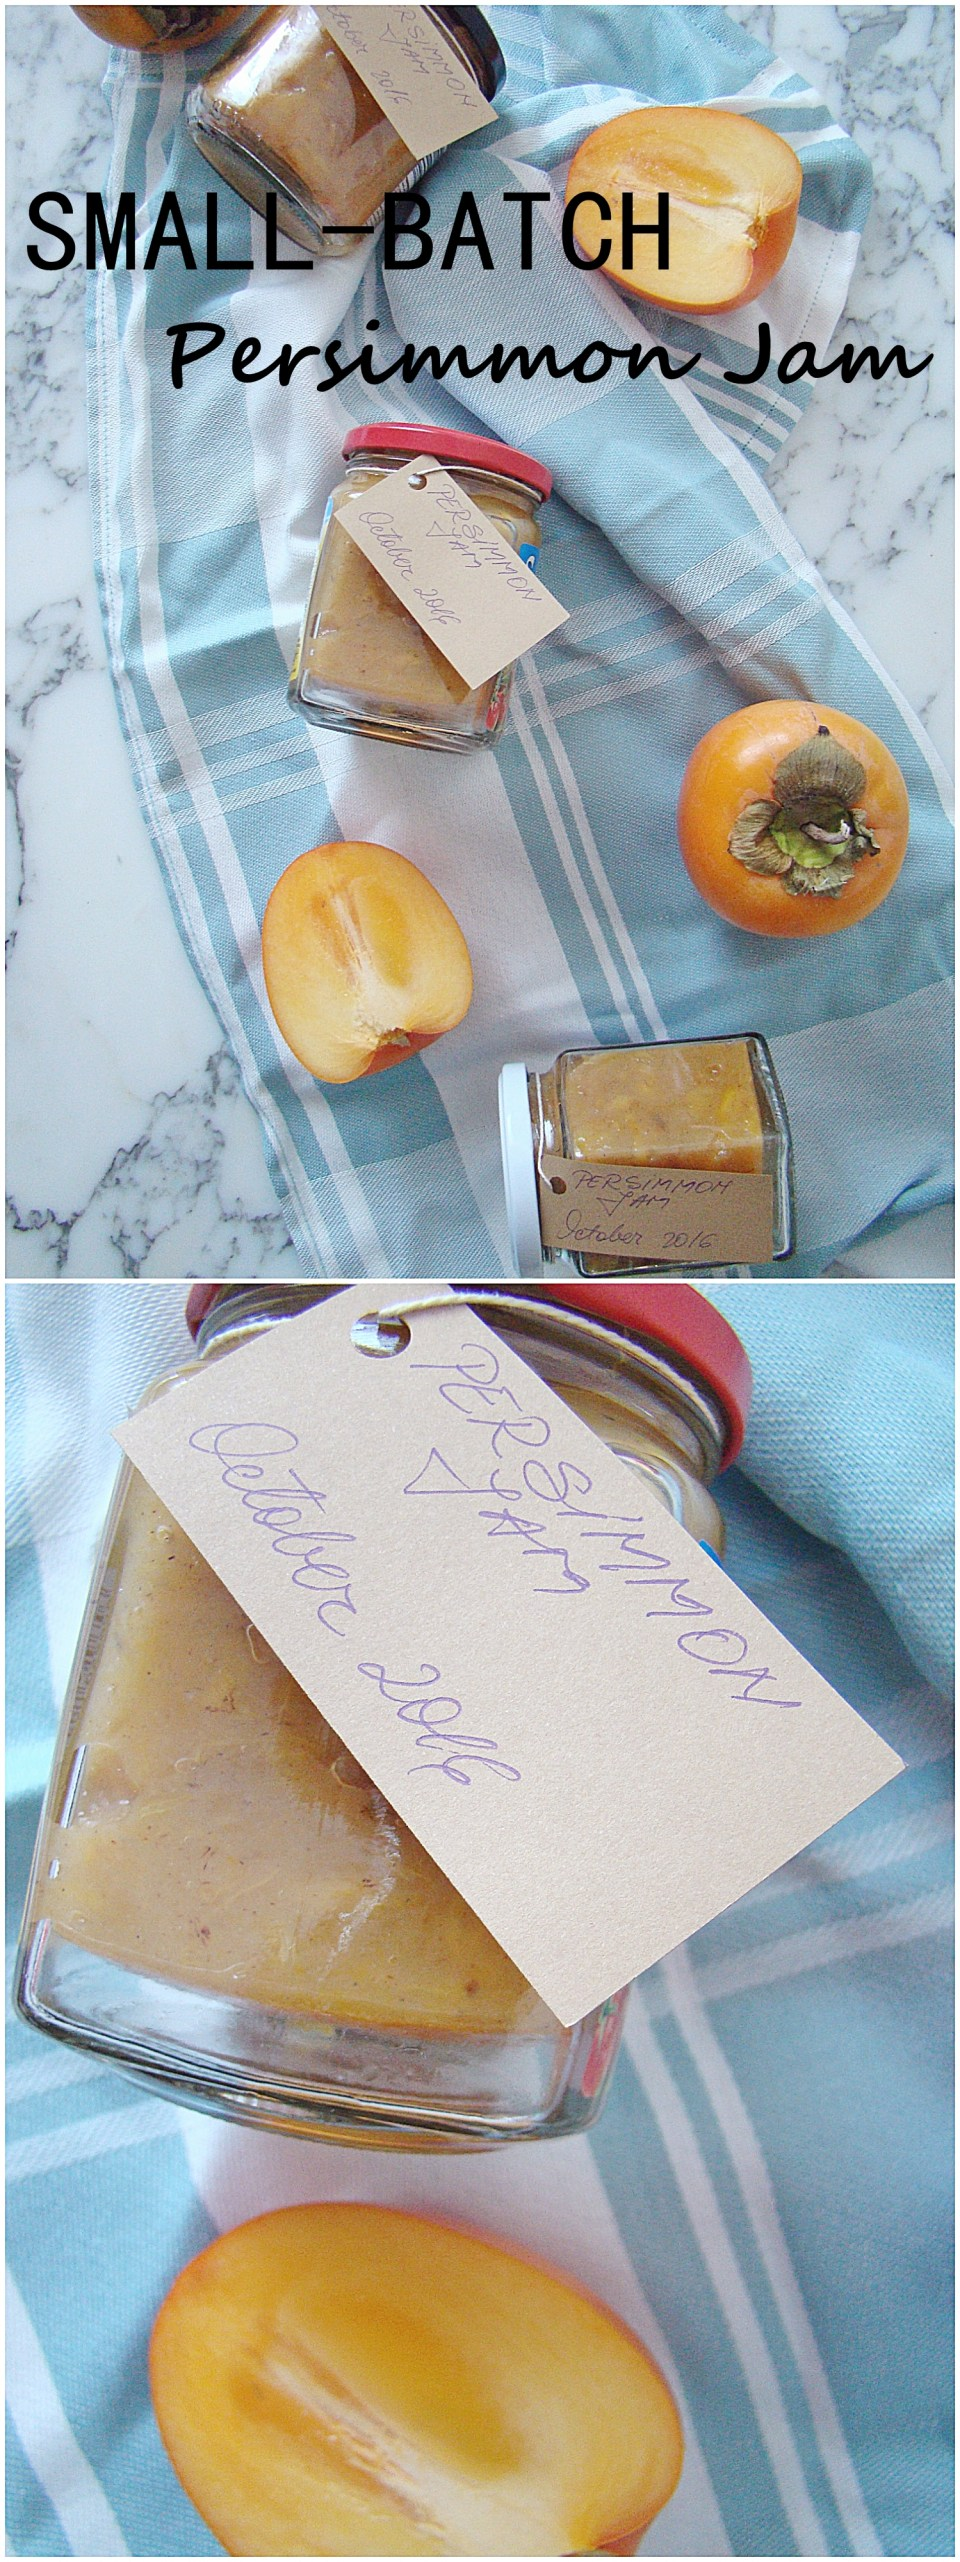 small-batch-persimmon-jam